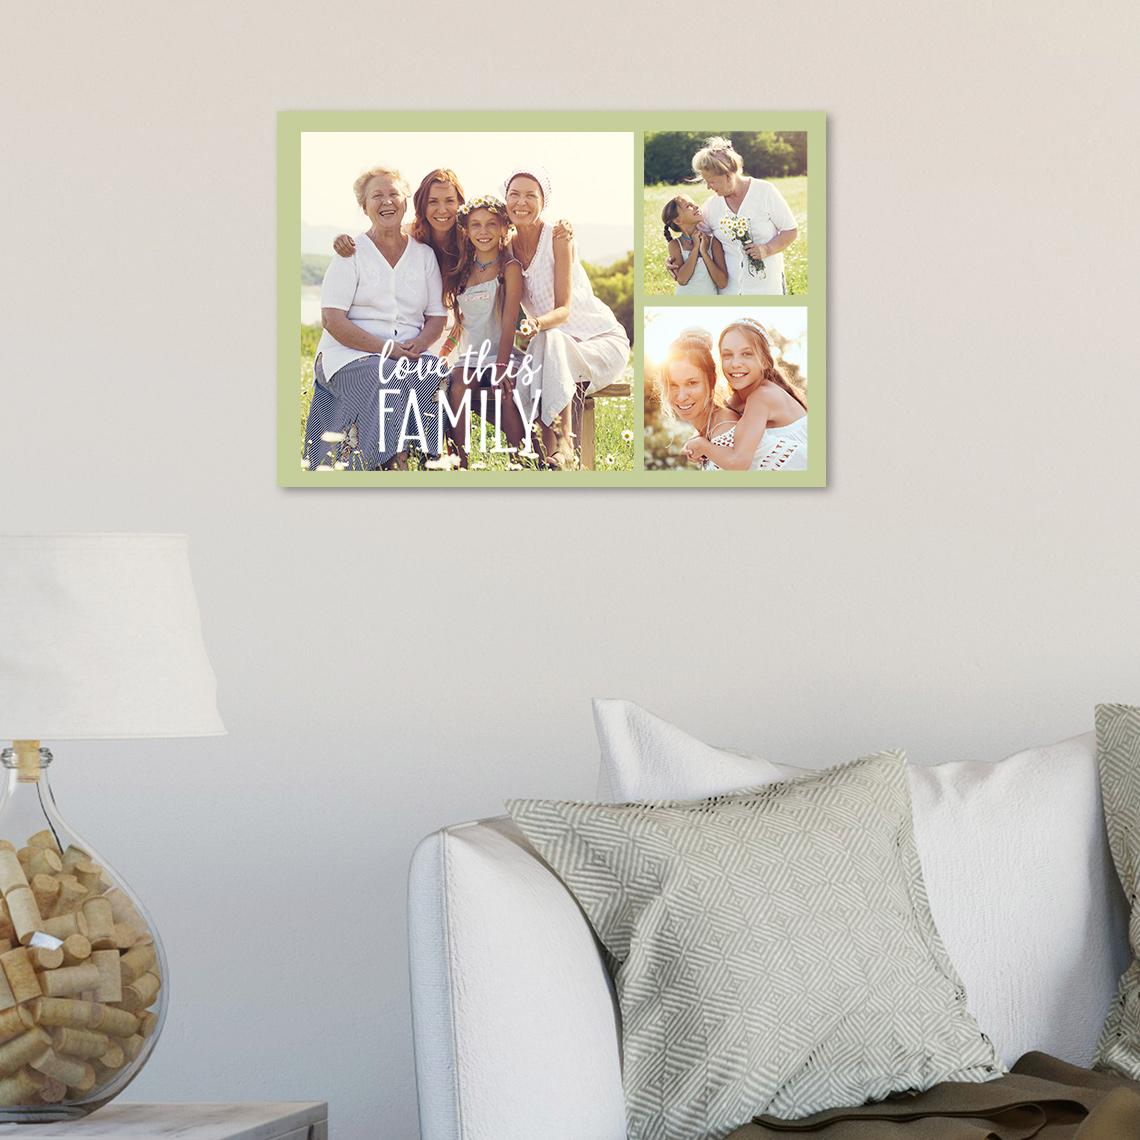 10x8 (25x20cm) Collage Photo Prints (Gloss)